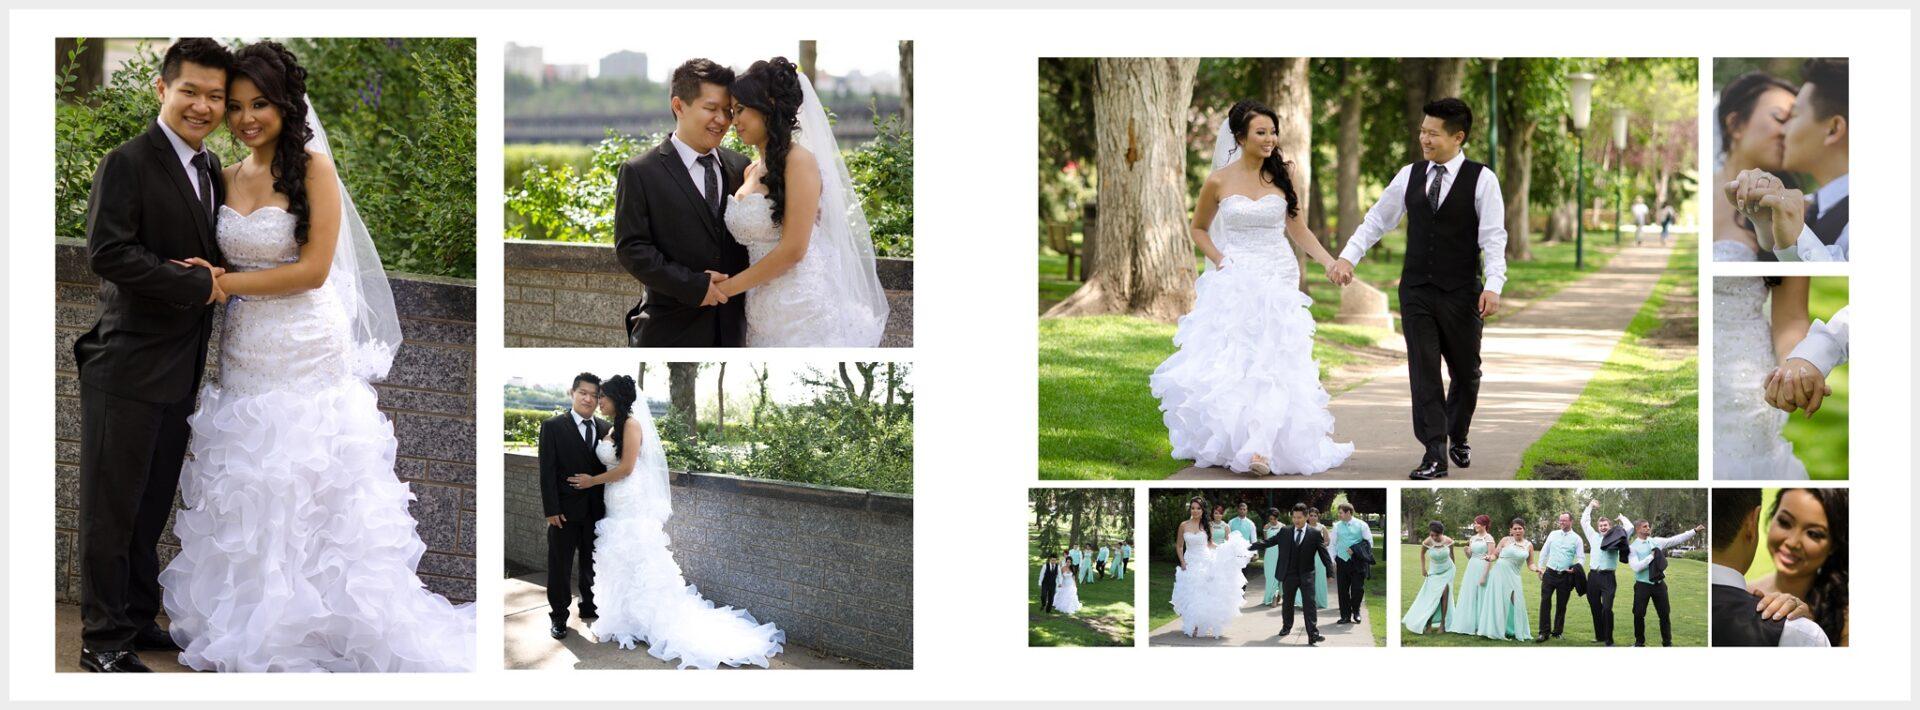 Cambodian Wedding Edmonton Calgary Photo Album-_0007